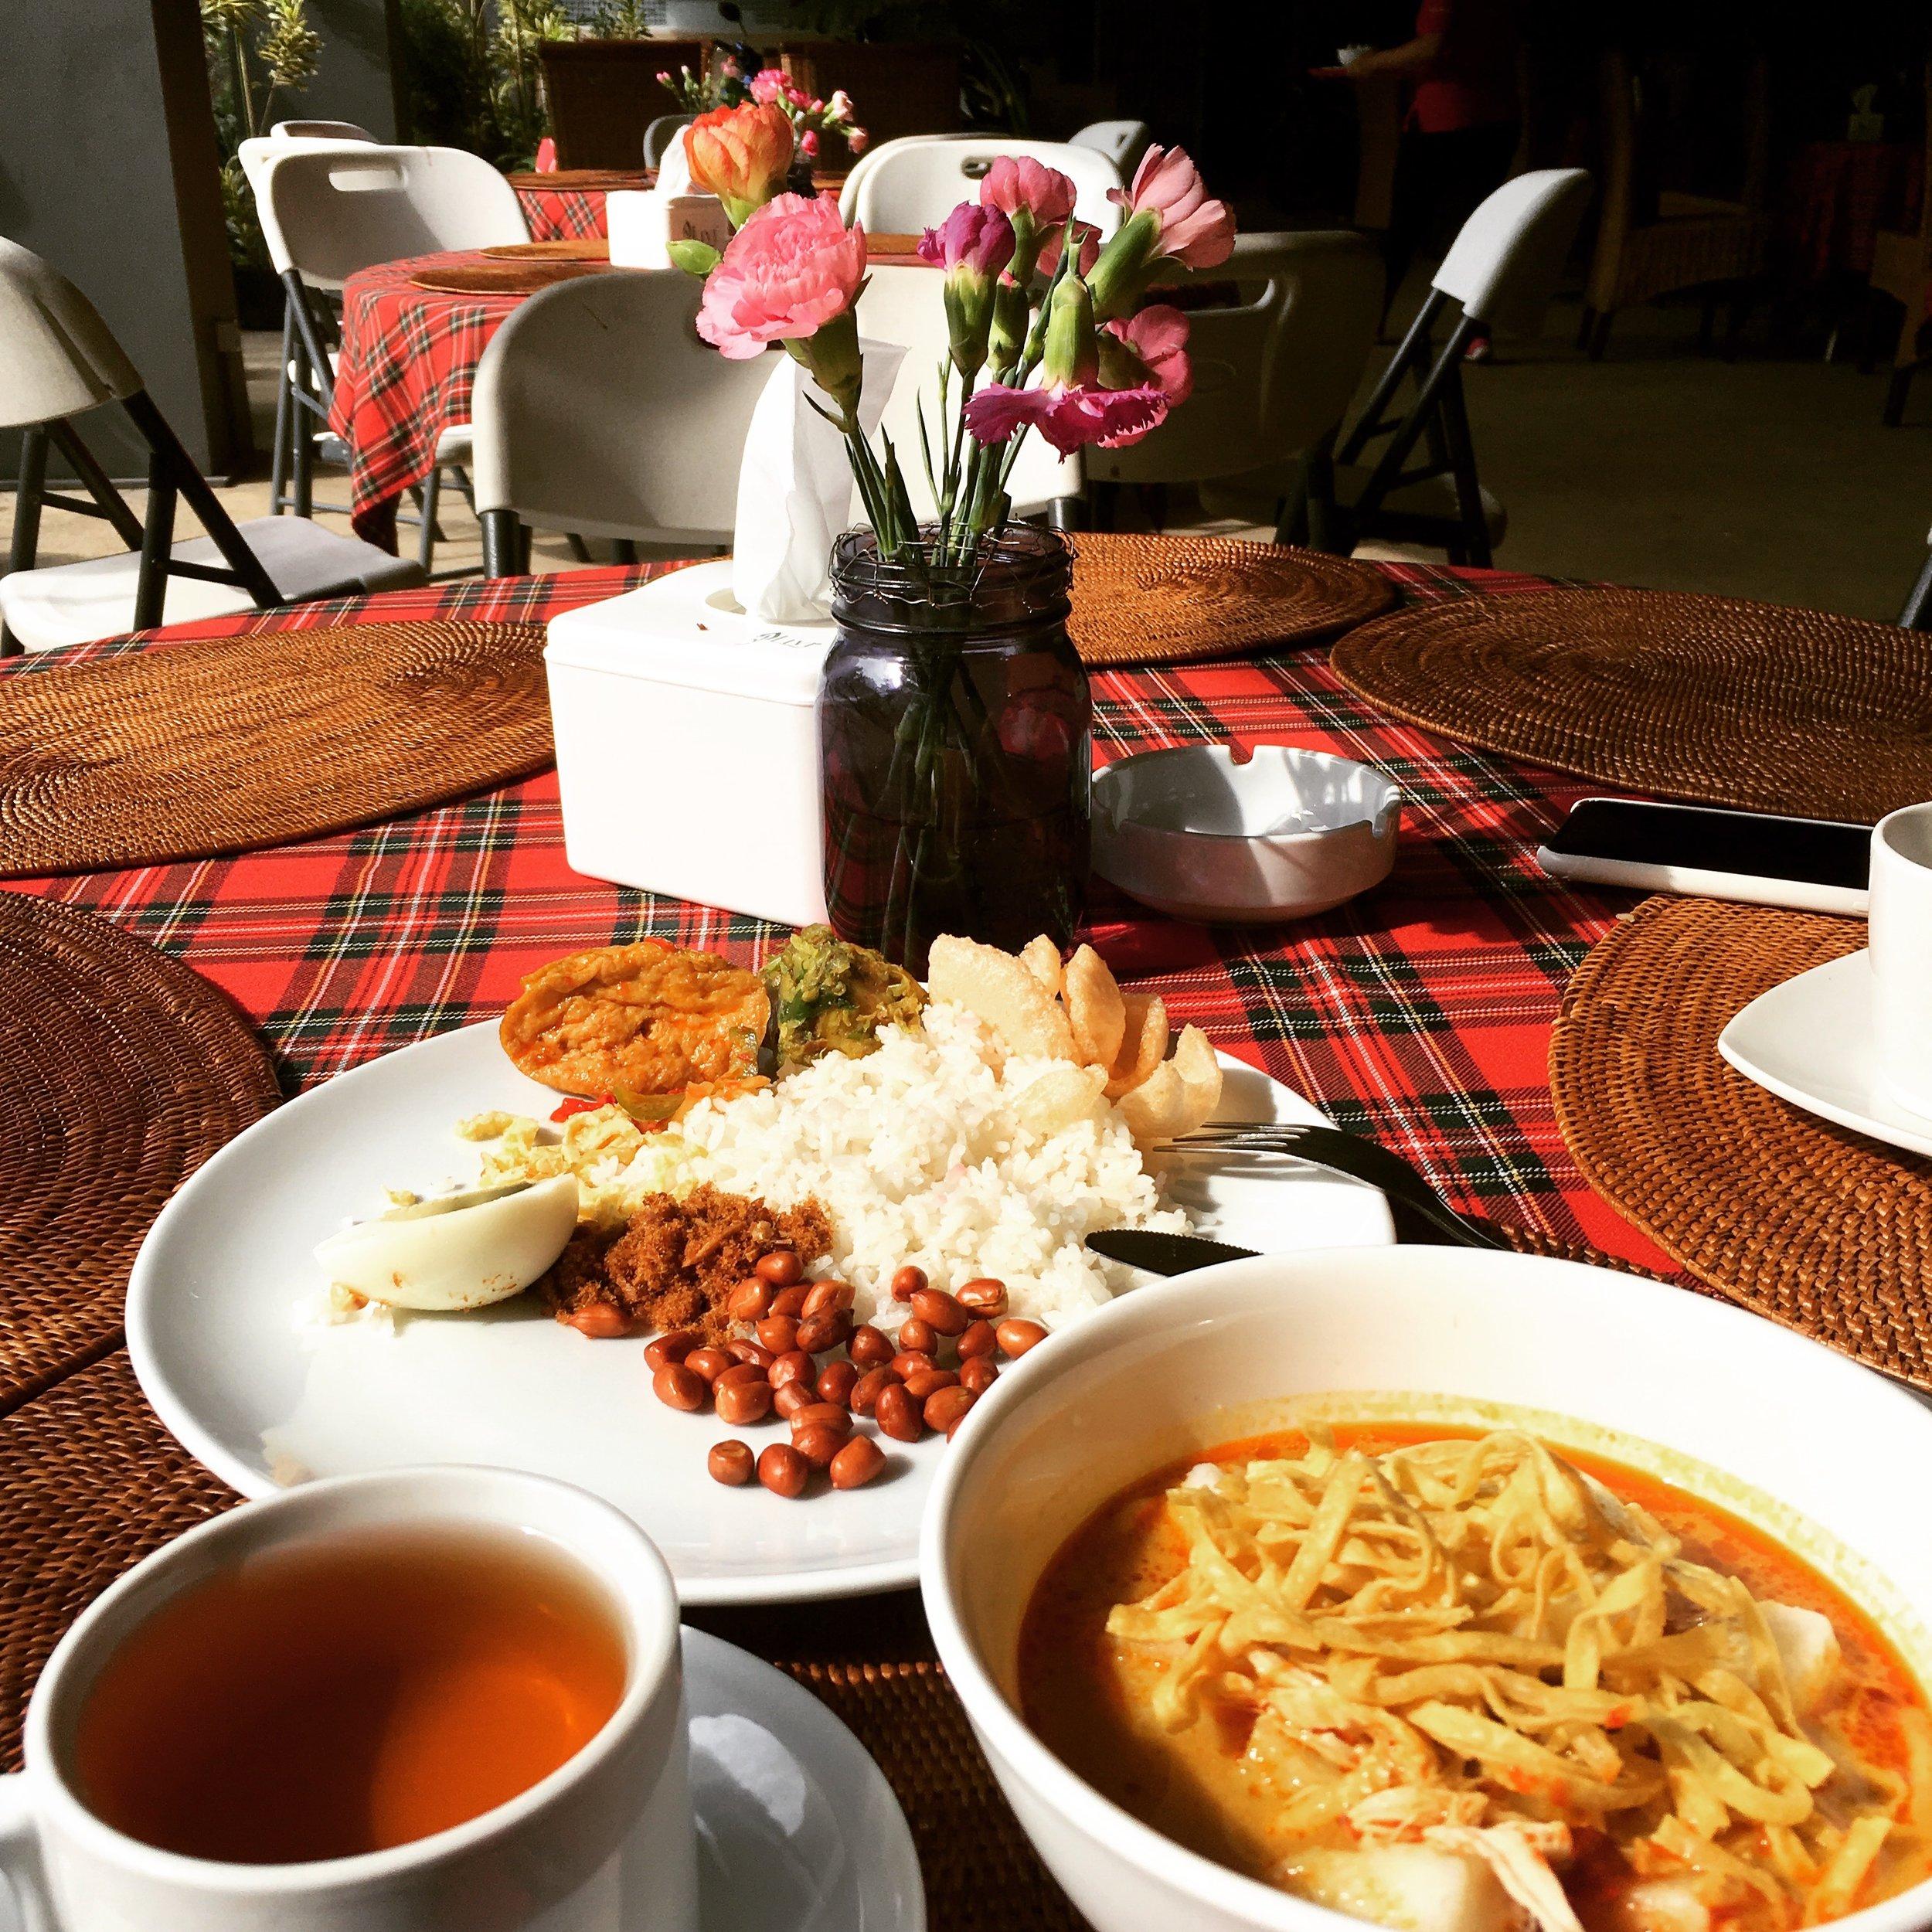 Soto soup (bottom right corner)